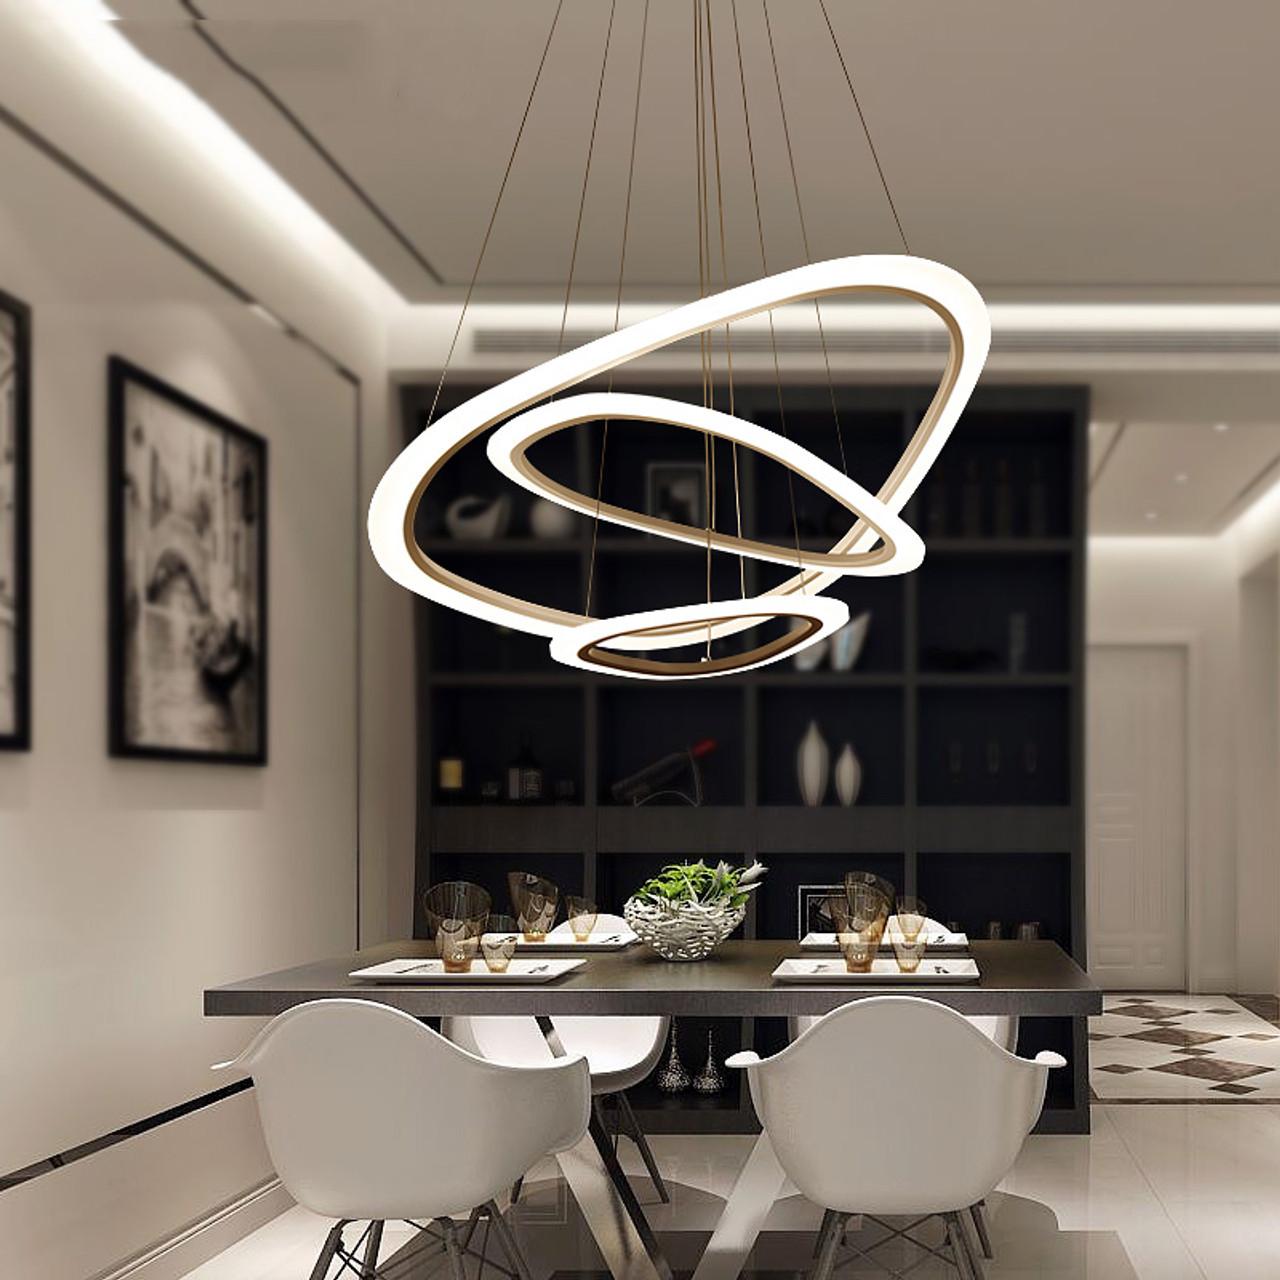 Led Chandelier Loft Illumination Nordic Suspension Luminaire Home Deco Lighting Fixtures Living Room Lamps Modern Hanging Lights Onshopdeals Com